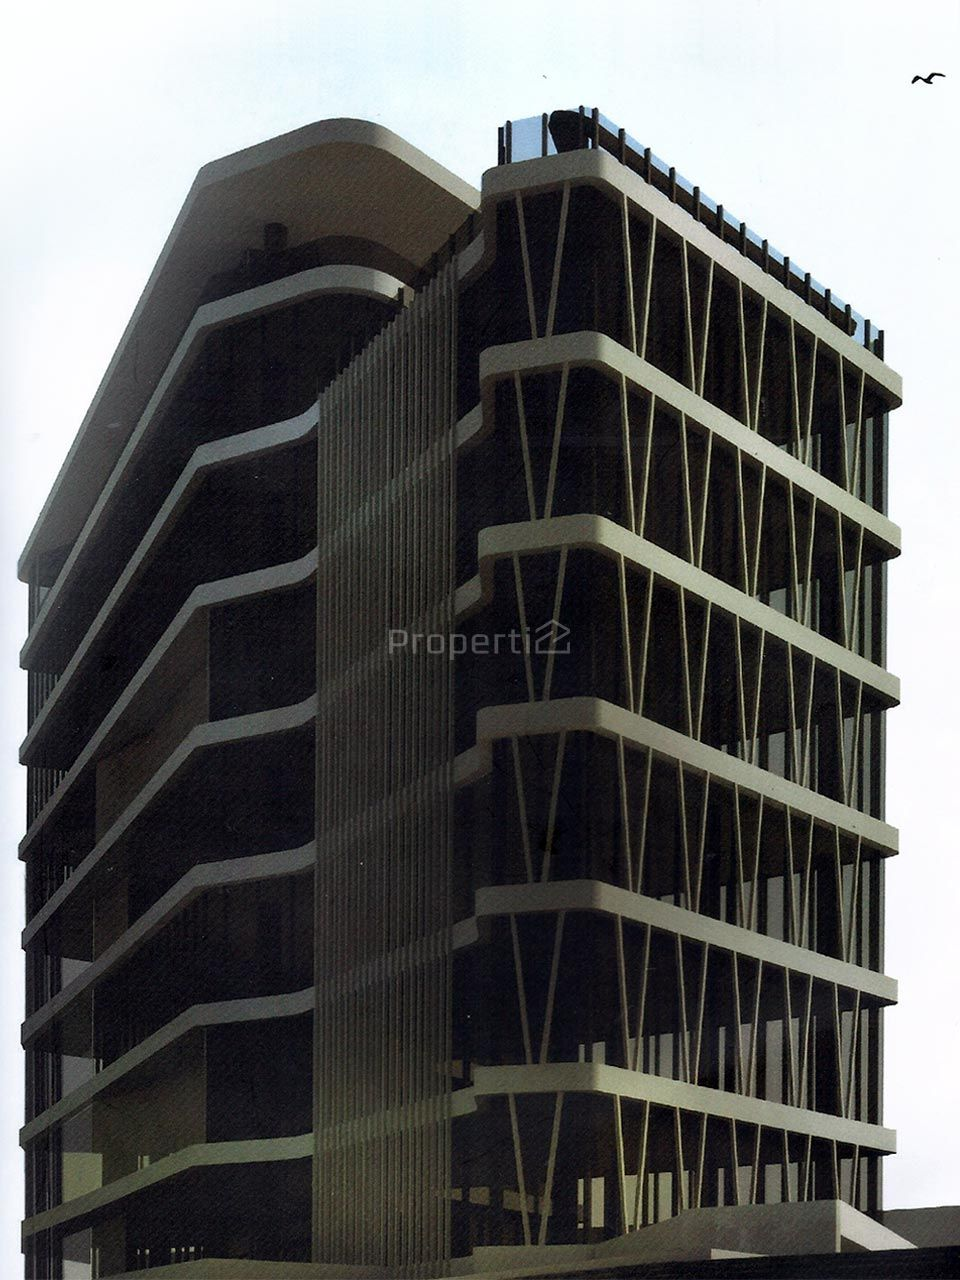 Gedung Kantor Baru di Tebet, DKI Jakarta